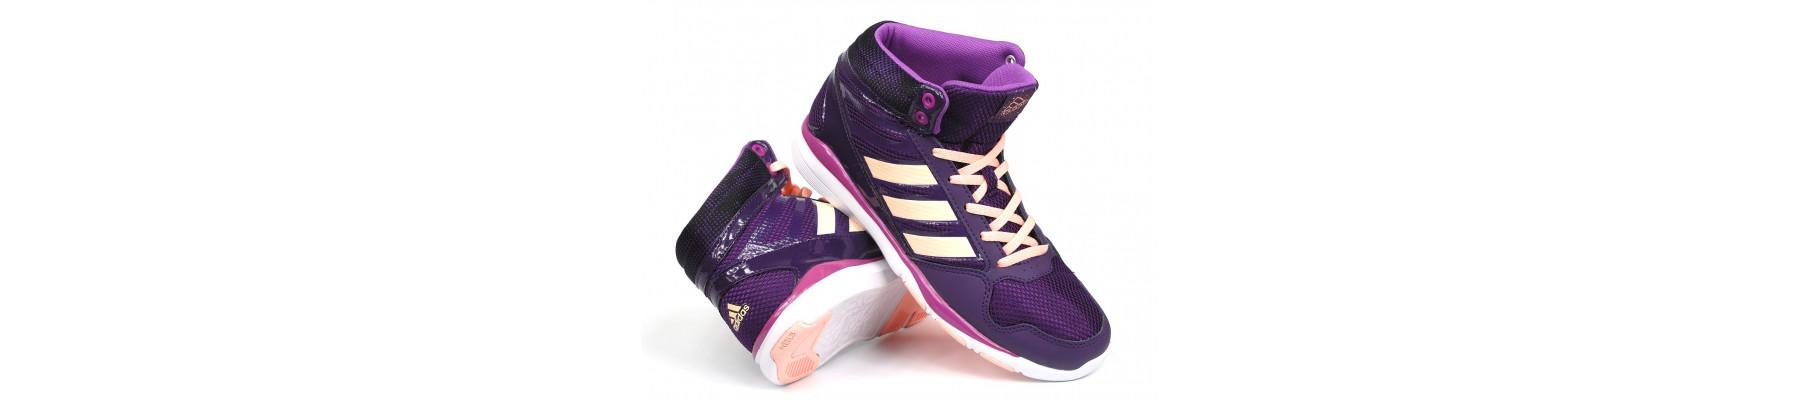 Adidas Dance Mid K TriPurGloco